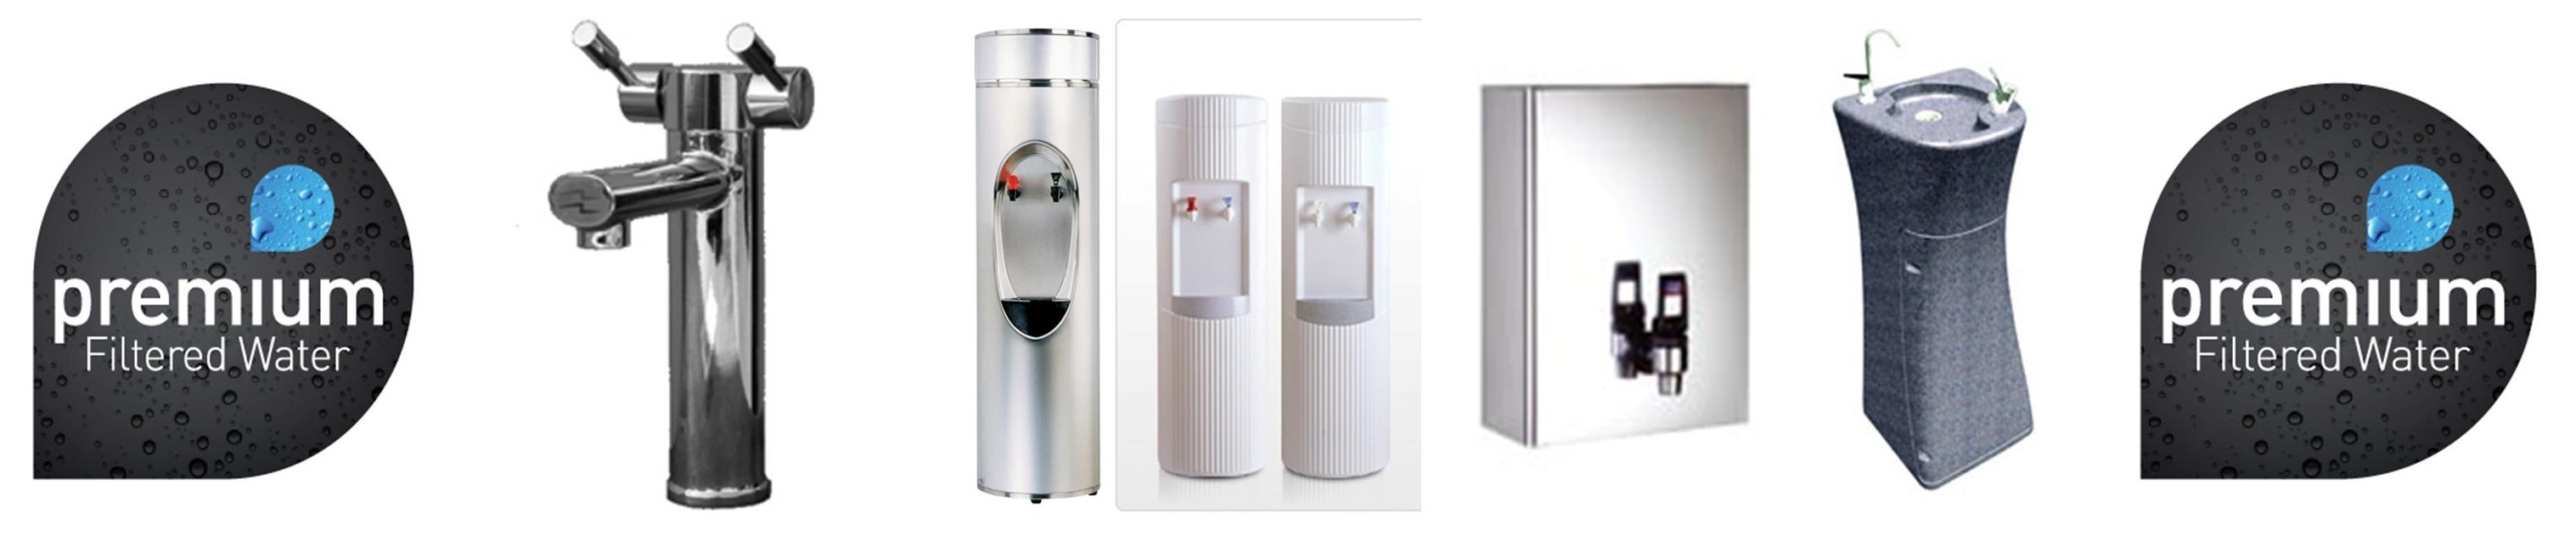 Premium Filtered Water (03) 9017 0386